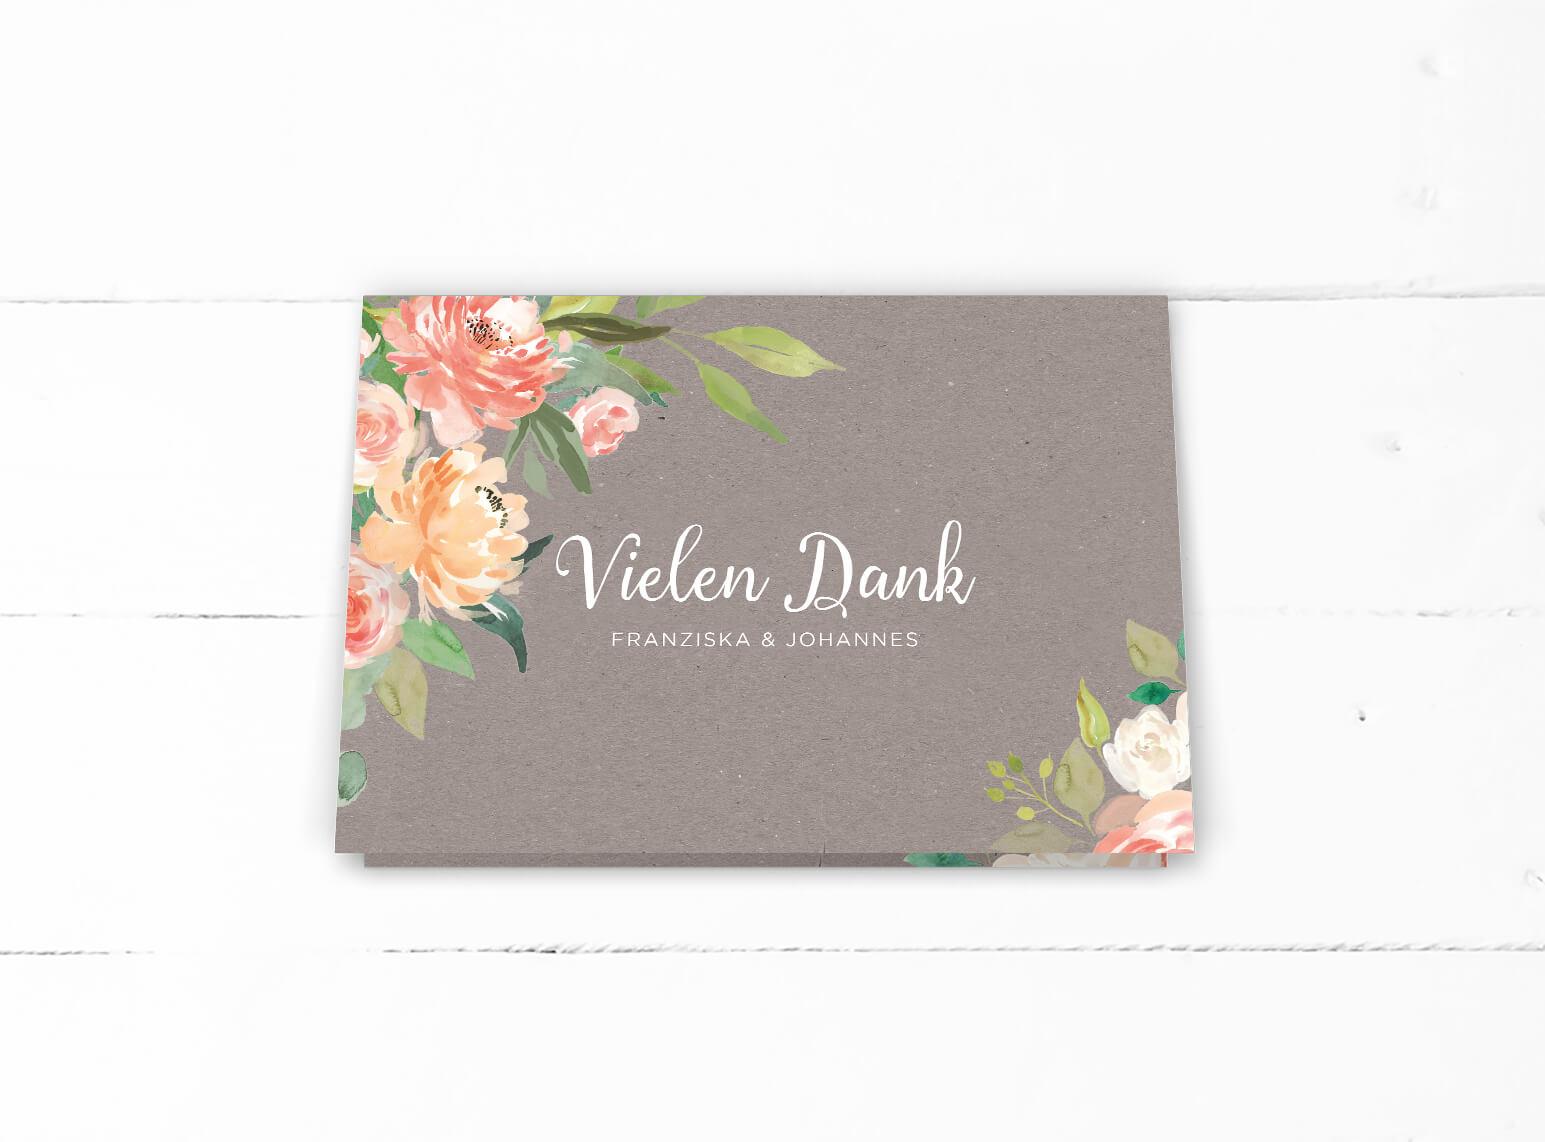 hochzeit-dankeskarte-klappkarte-dina-6-quer-aquarell-blumen-kraftpapier_front_MP0007-7.2.1